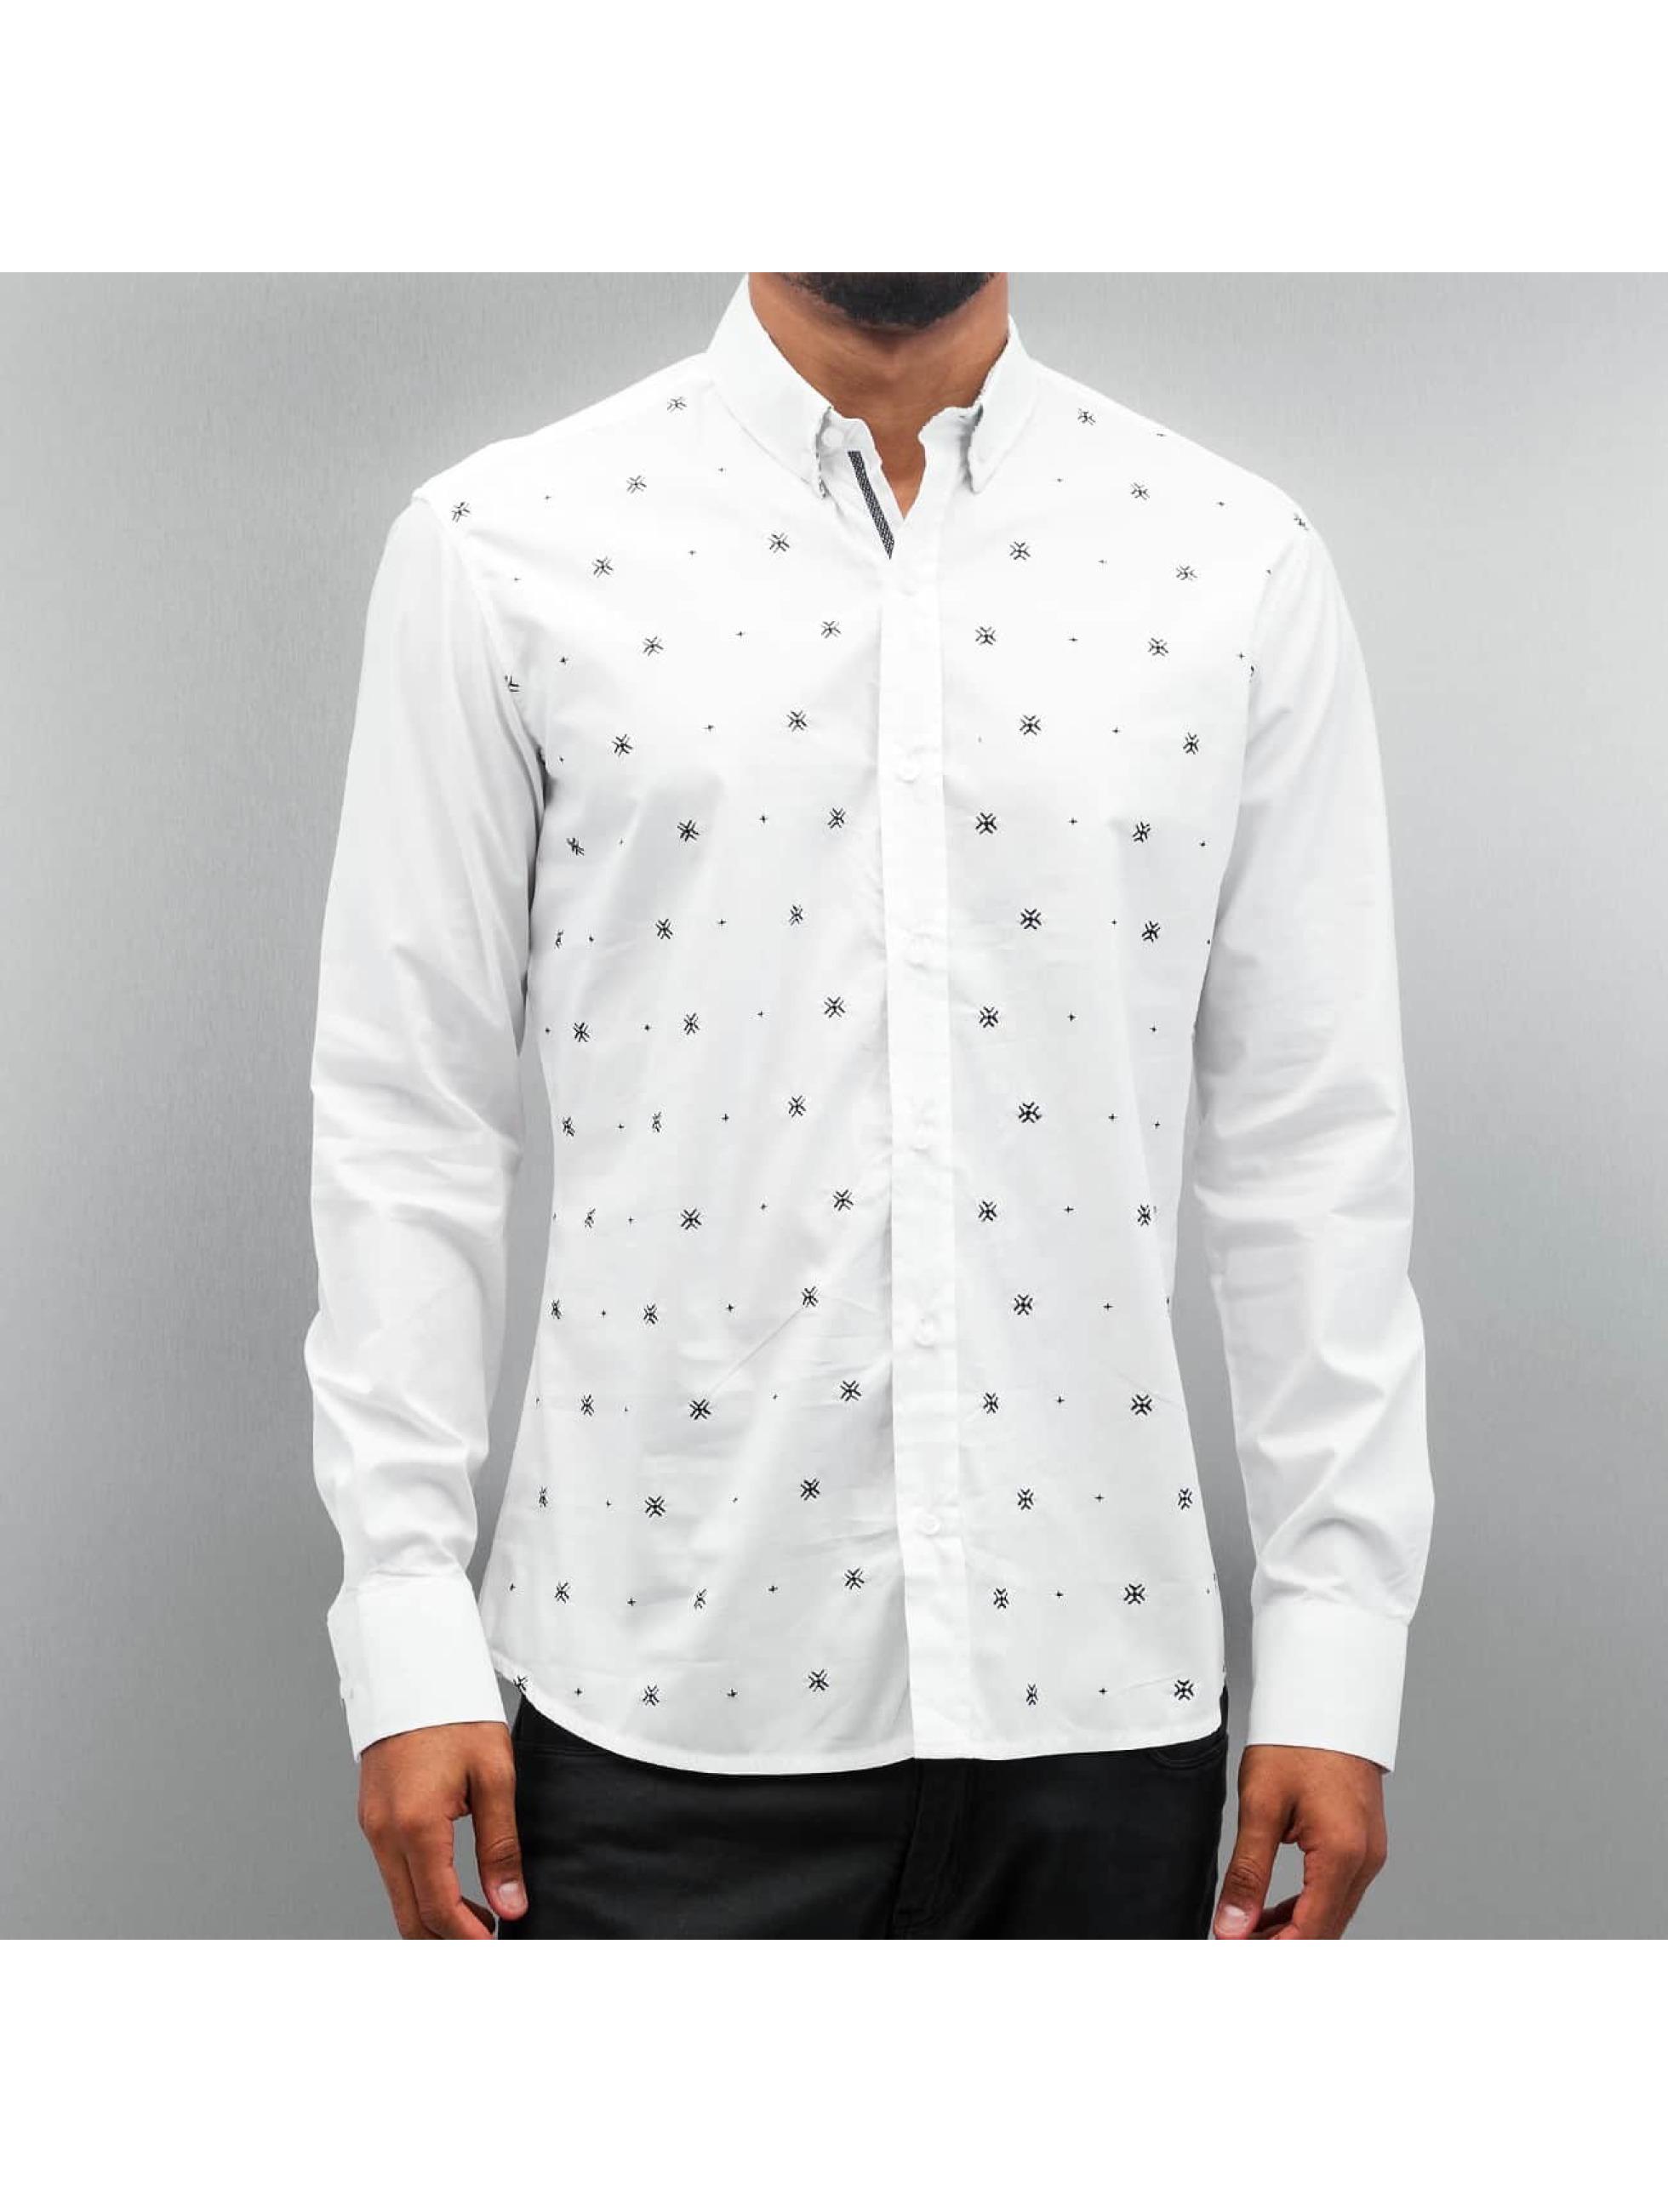 Open Skjorter Stitch hvit